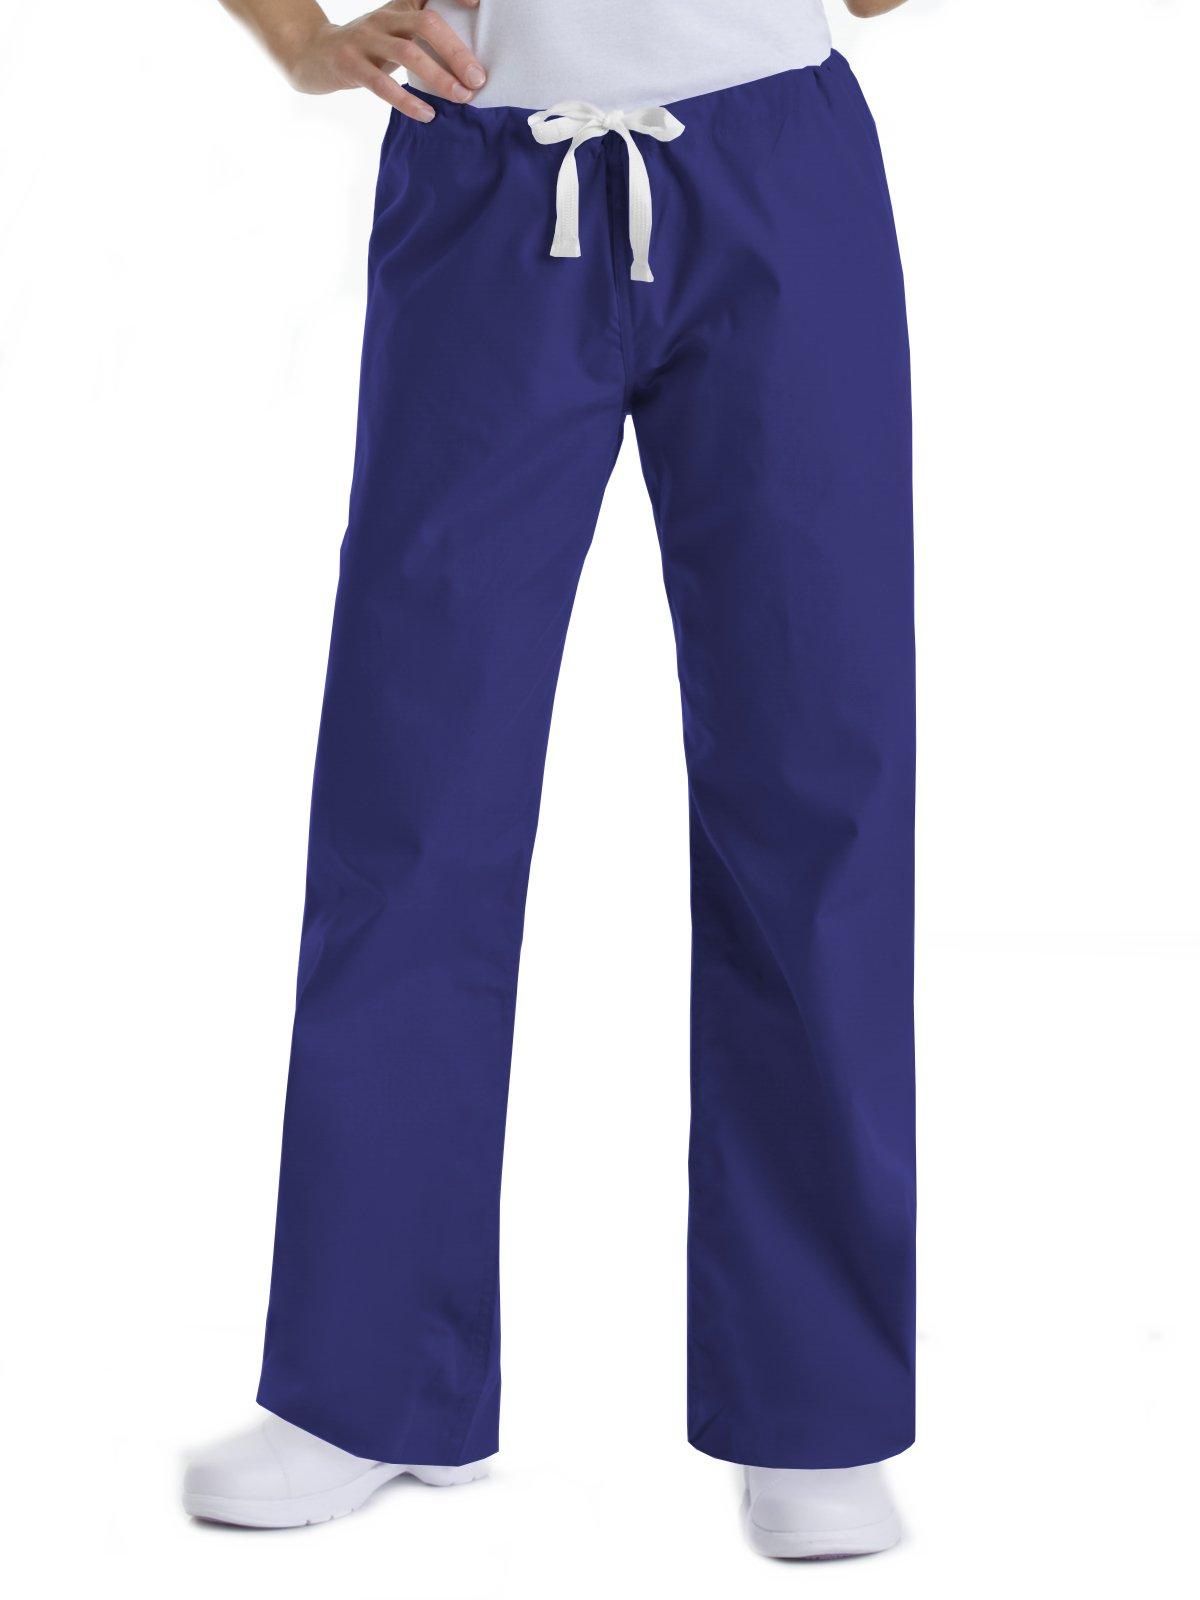 Urbane Essentials 9502 Relaxed Drawstring Pant Galaxy Blue XL